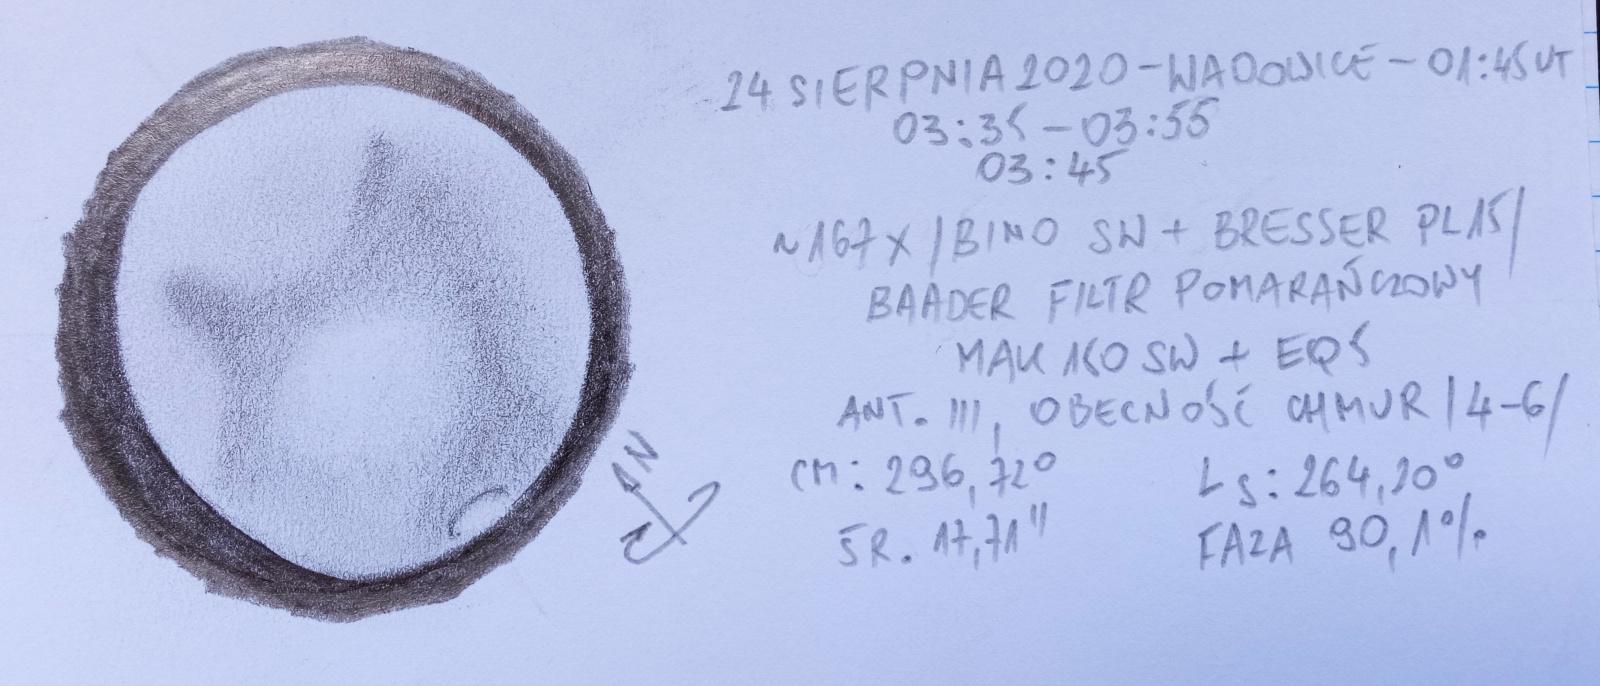 IMG_20200824_111859.jpg